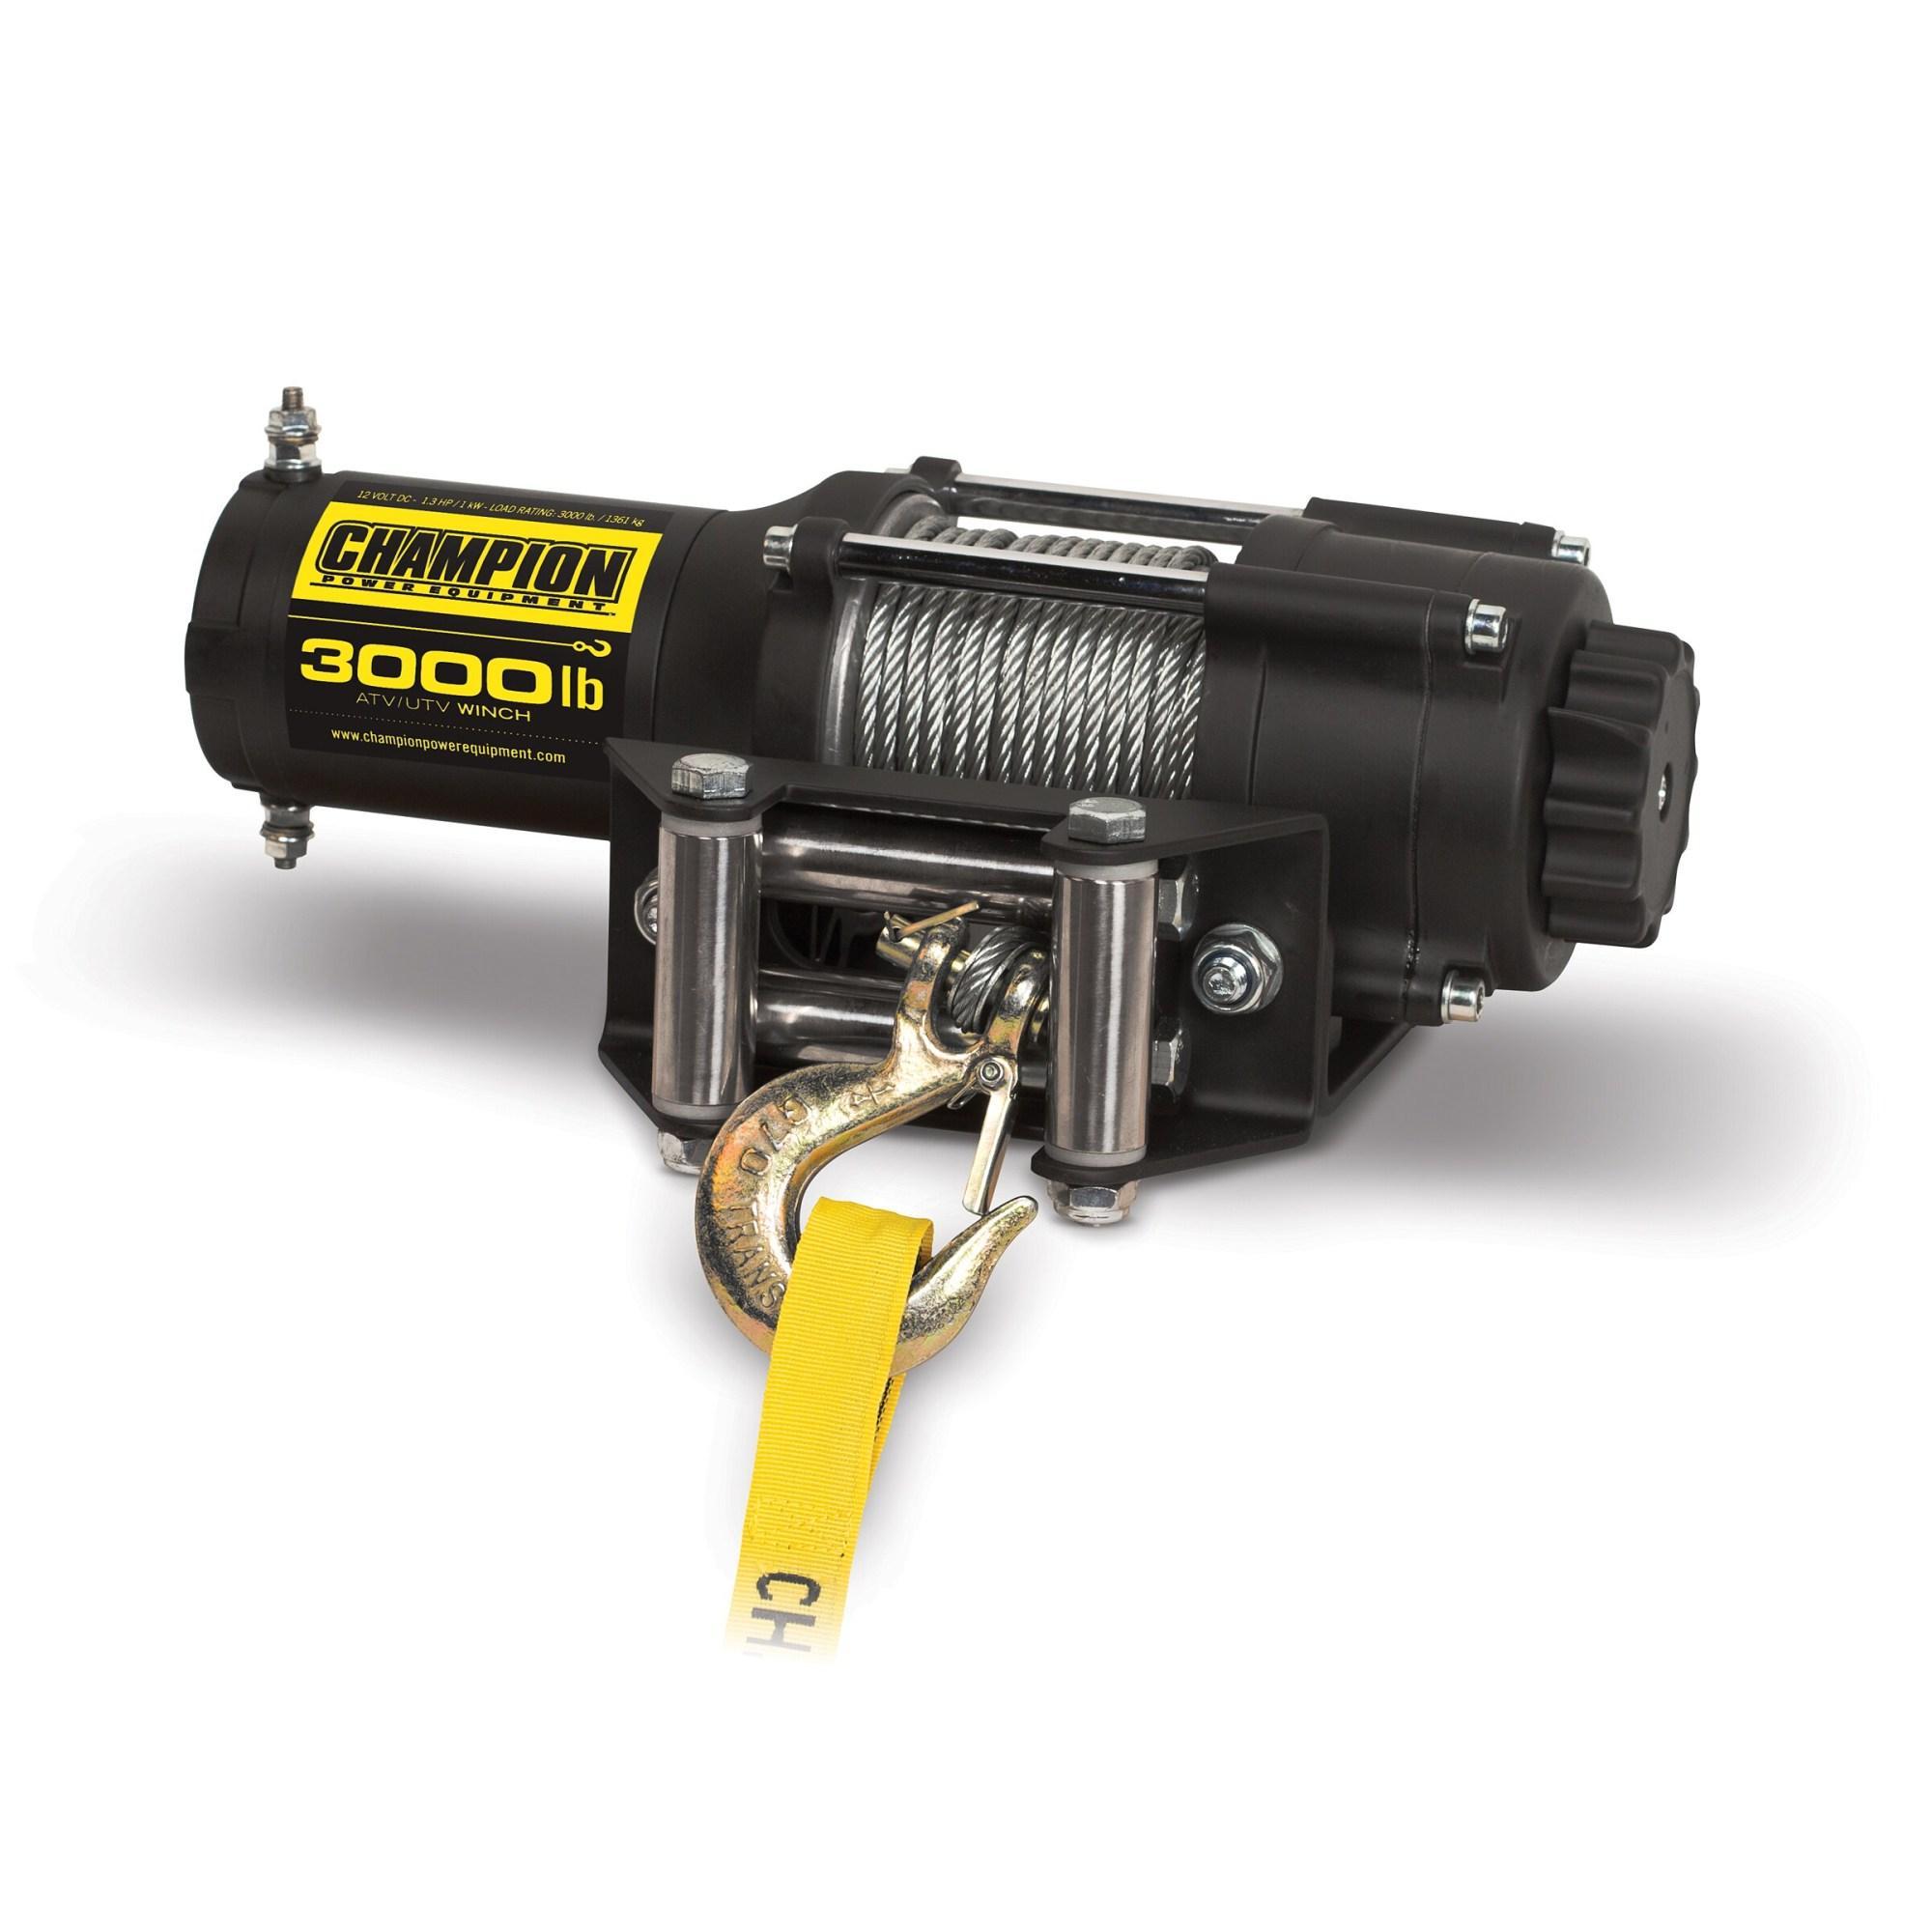 hight resolution of shop champion 3000 lb atv utv winch kit free shipping today overstock 7658724